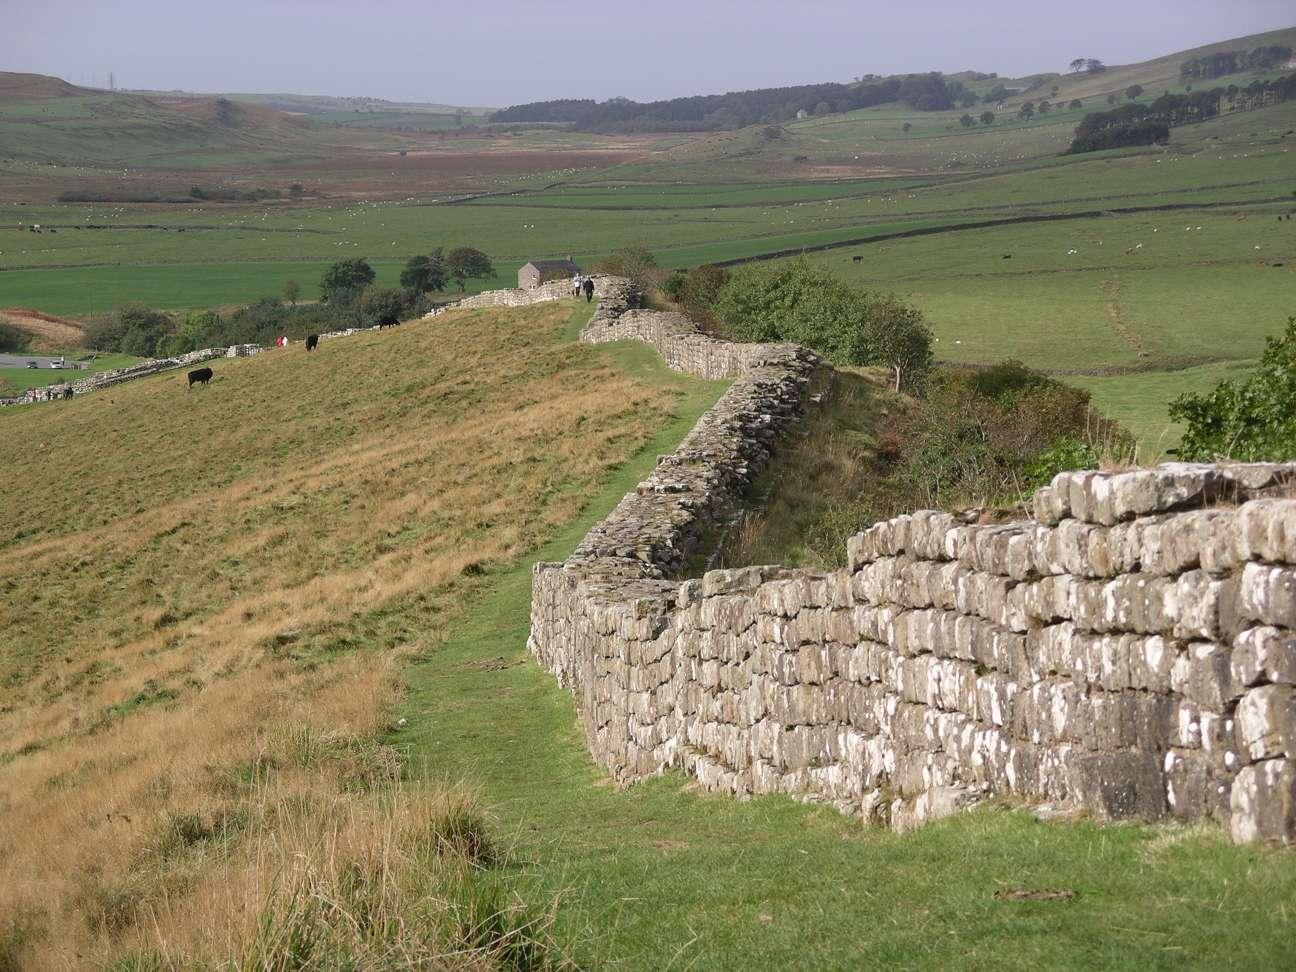 File:Hadrians wall at Greenhead Lough.jpg - Wikipedia